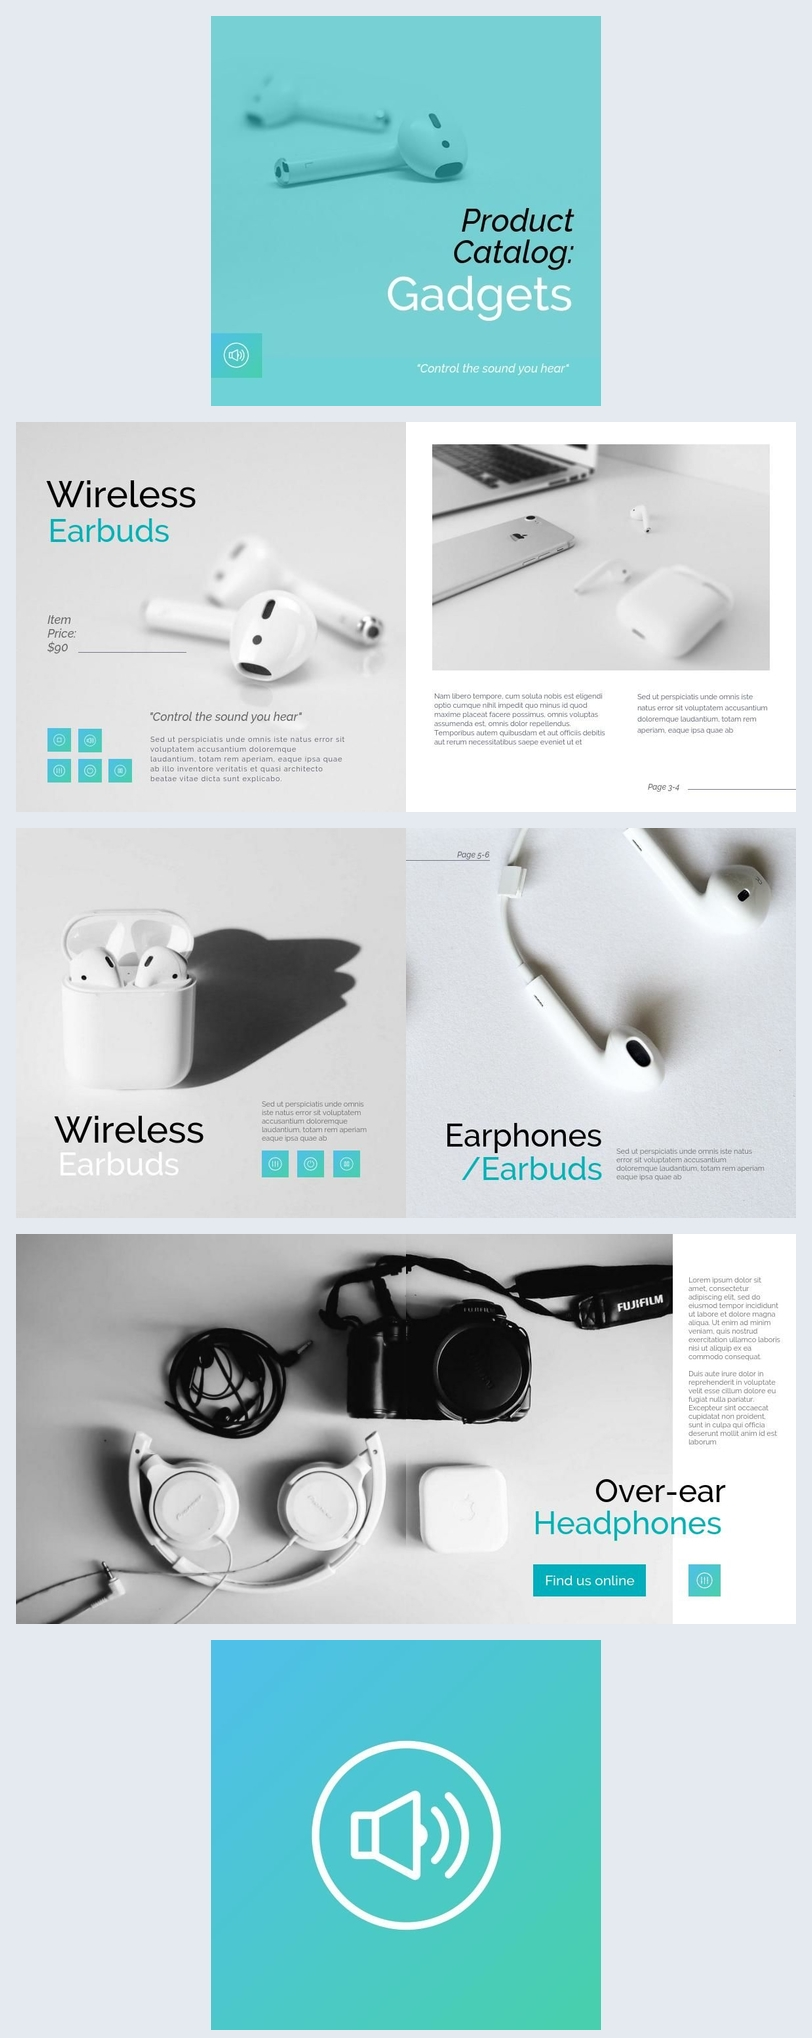 Elektronik- & Technik-Gadgets Katalog-Design